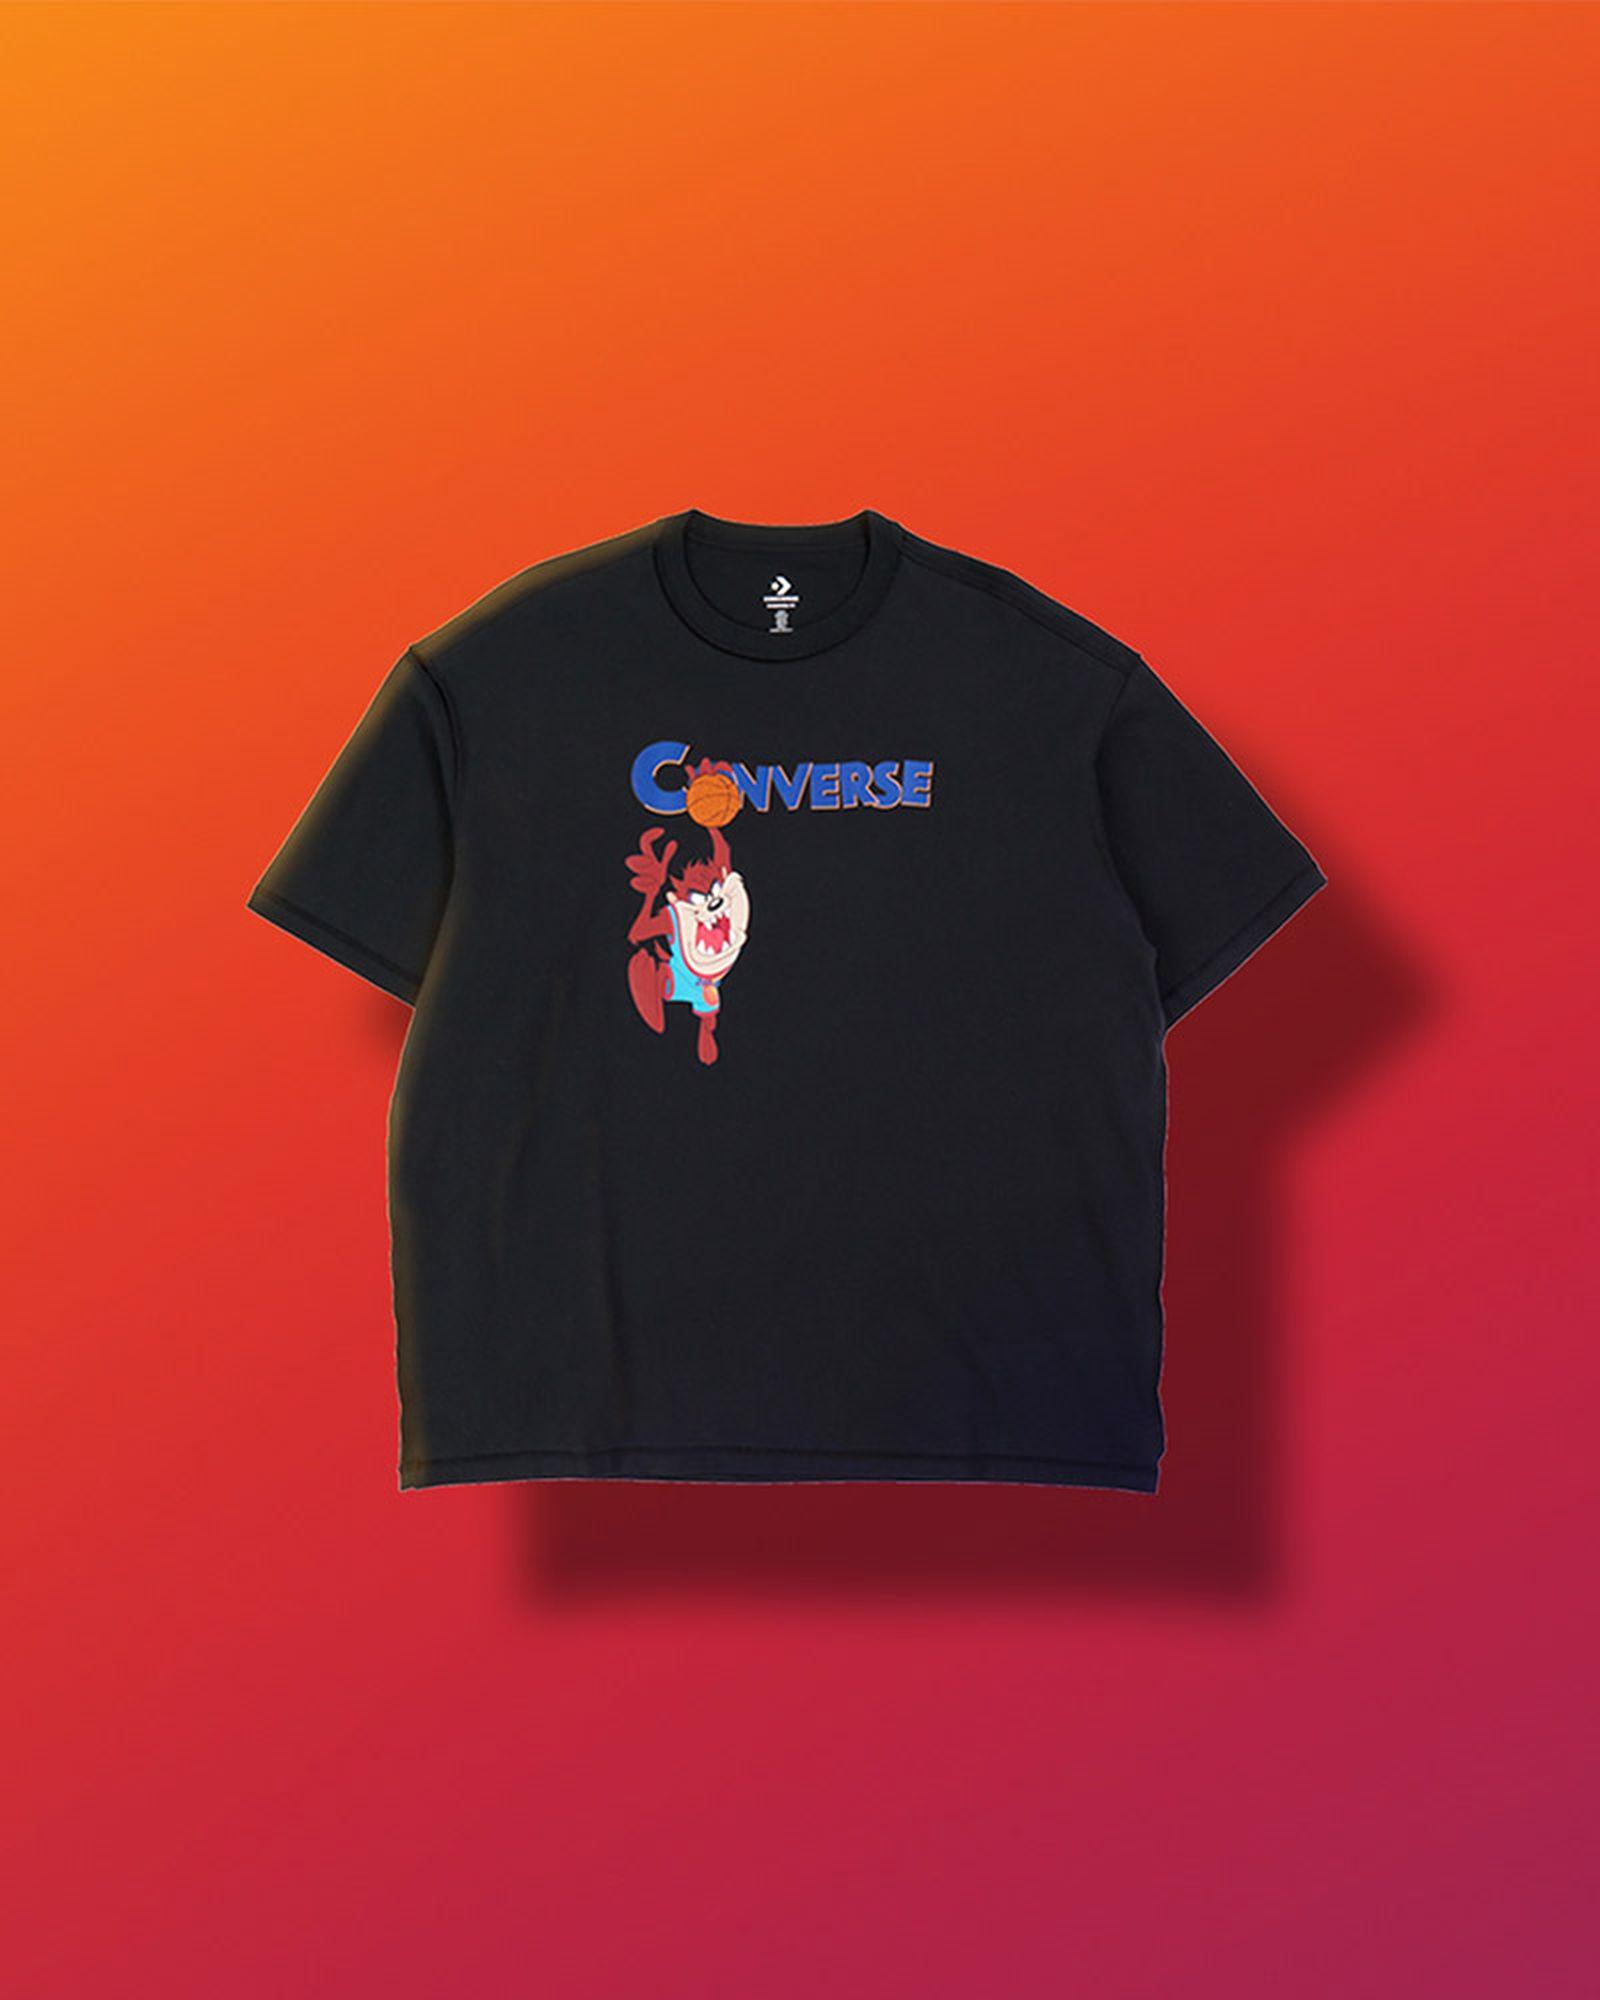 nike-space-jam-2-merch-016